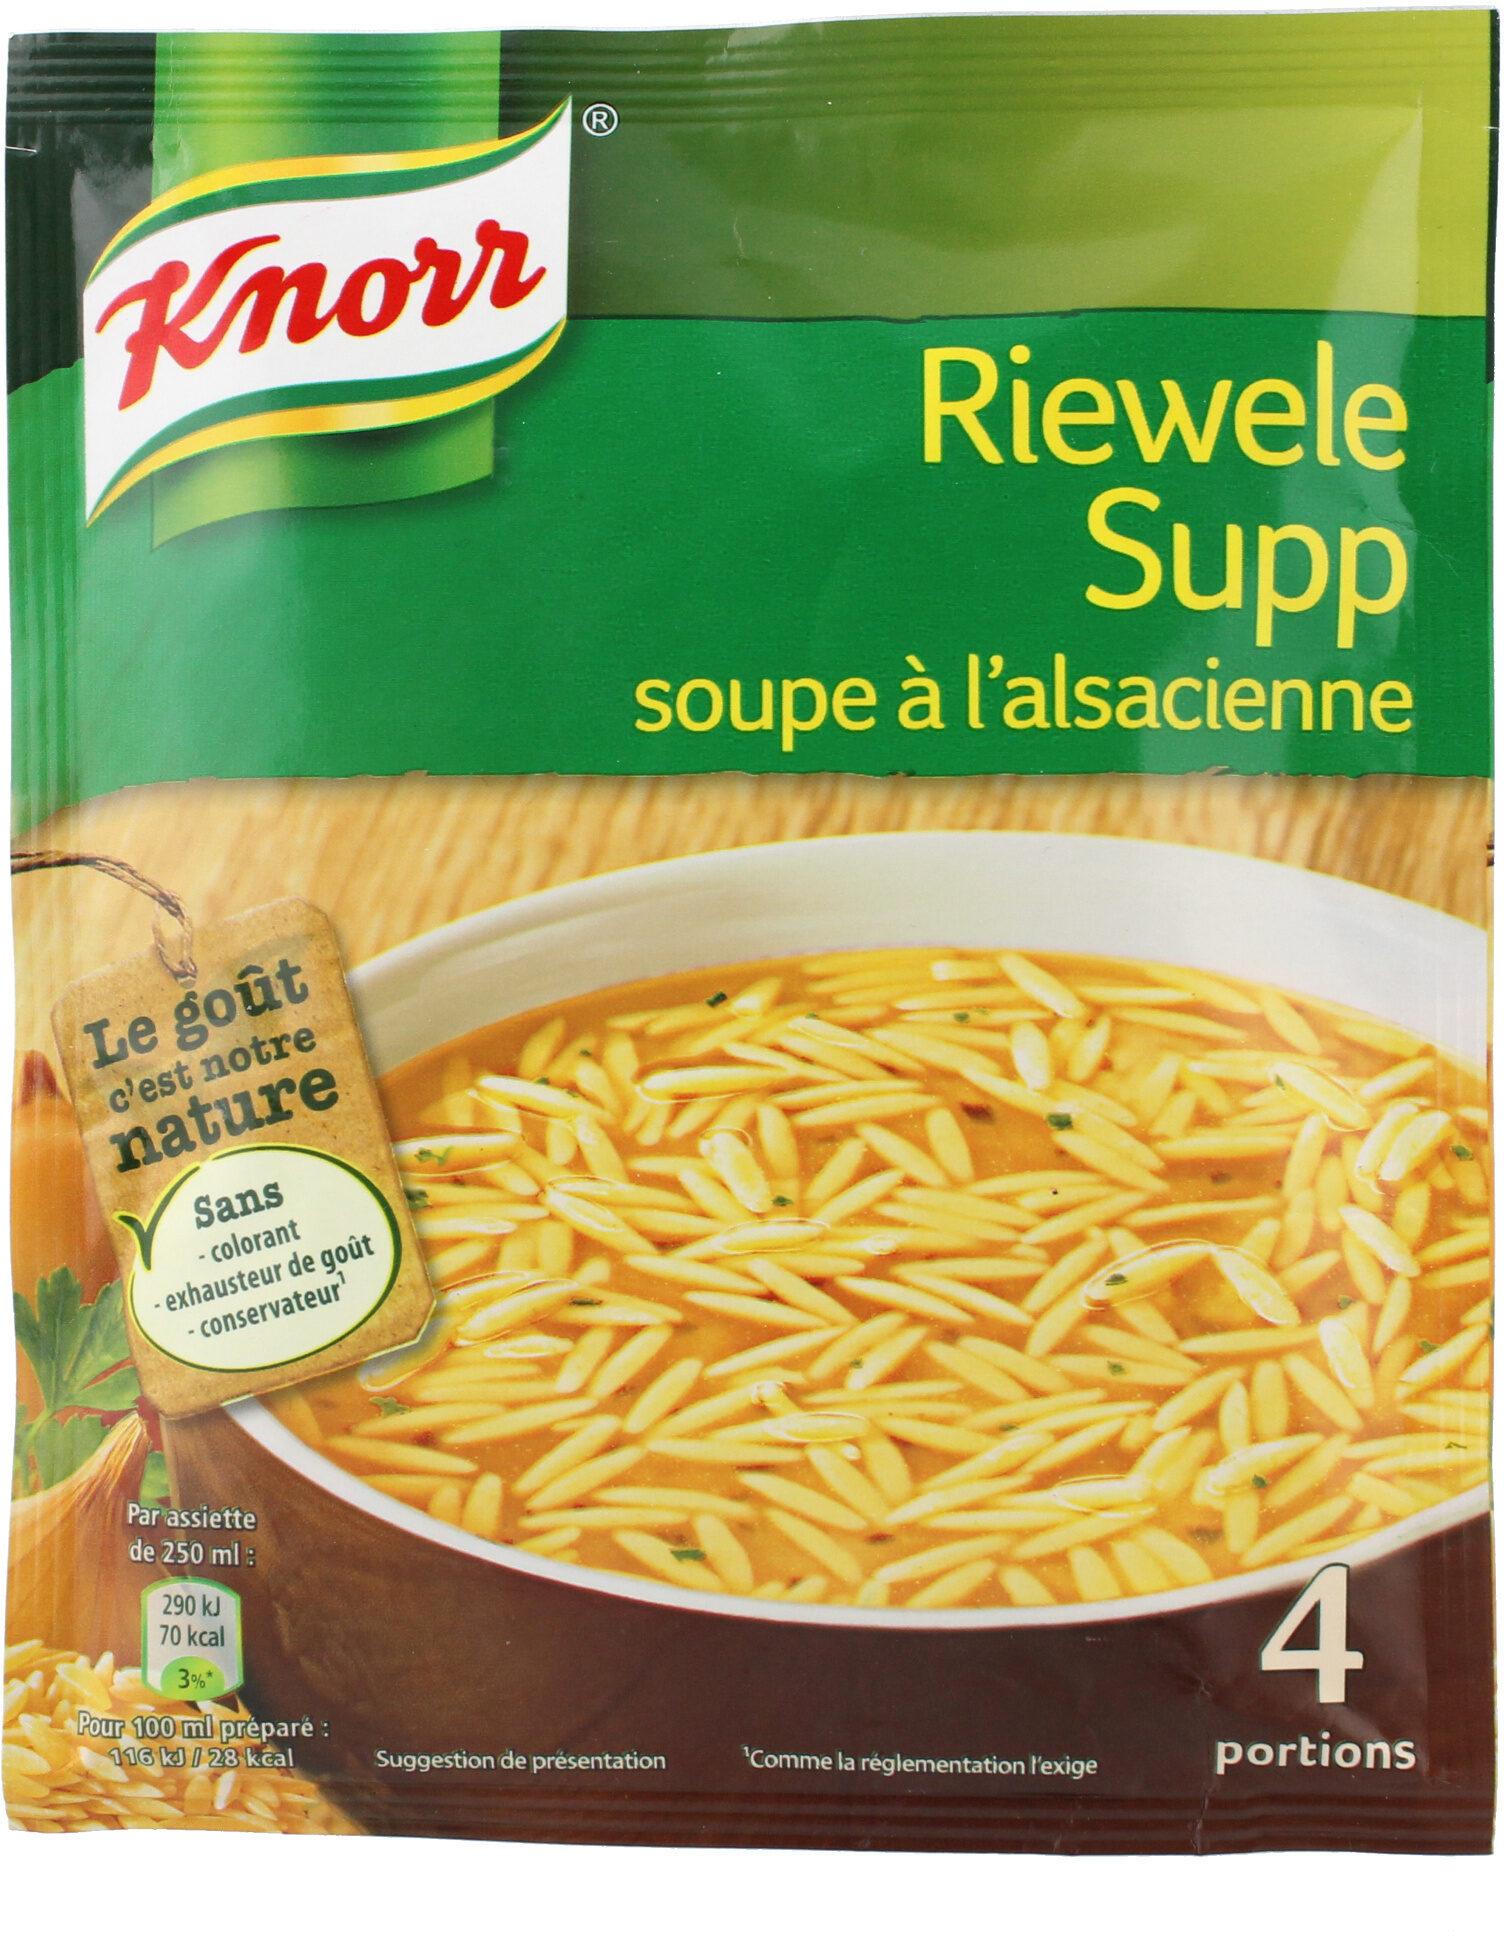 Knorr Soupe À L'Alsacienne Riewele Supp 74g 4 Portions - Product - fr